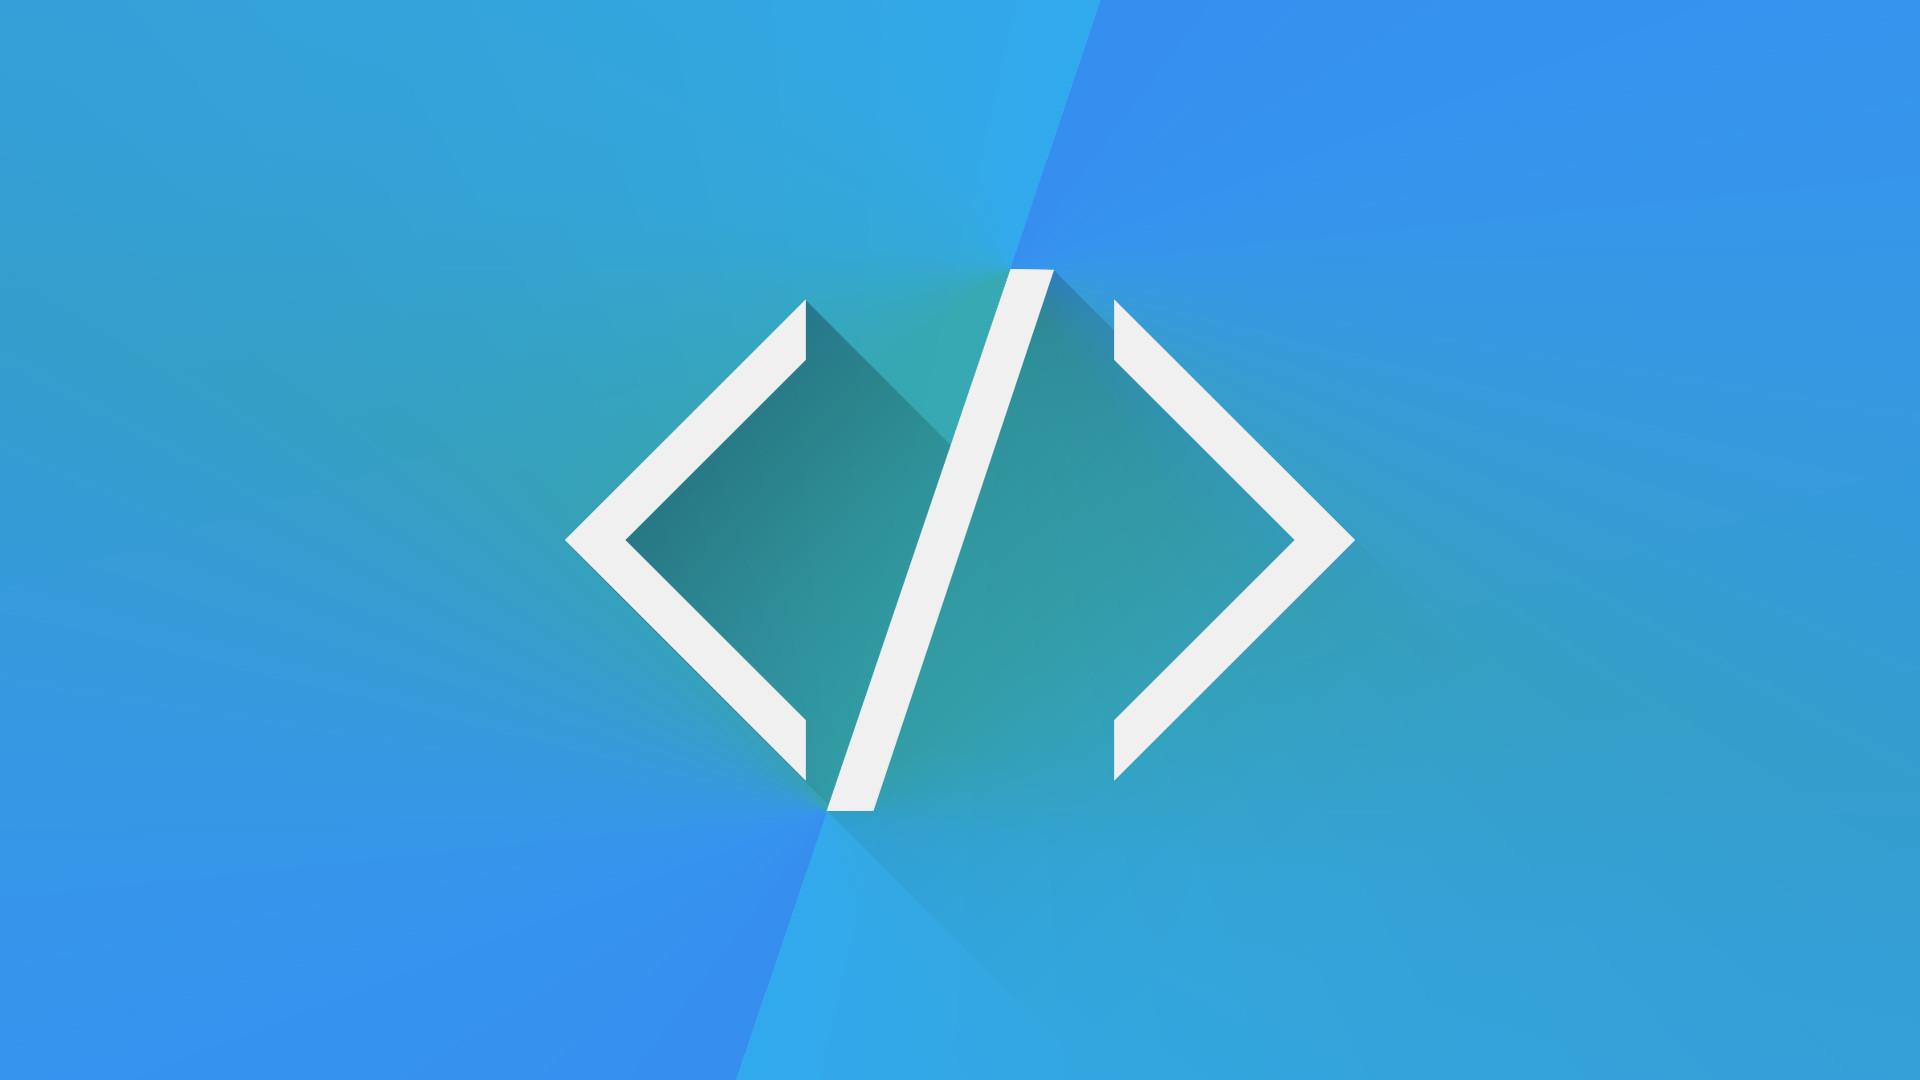 Web Developer Wallpaper (84+ images)